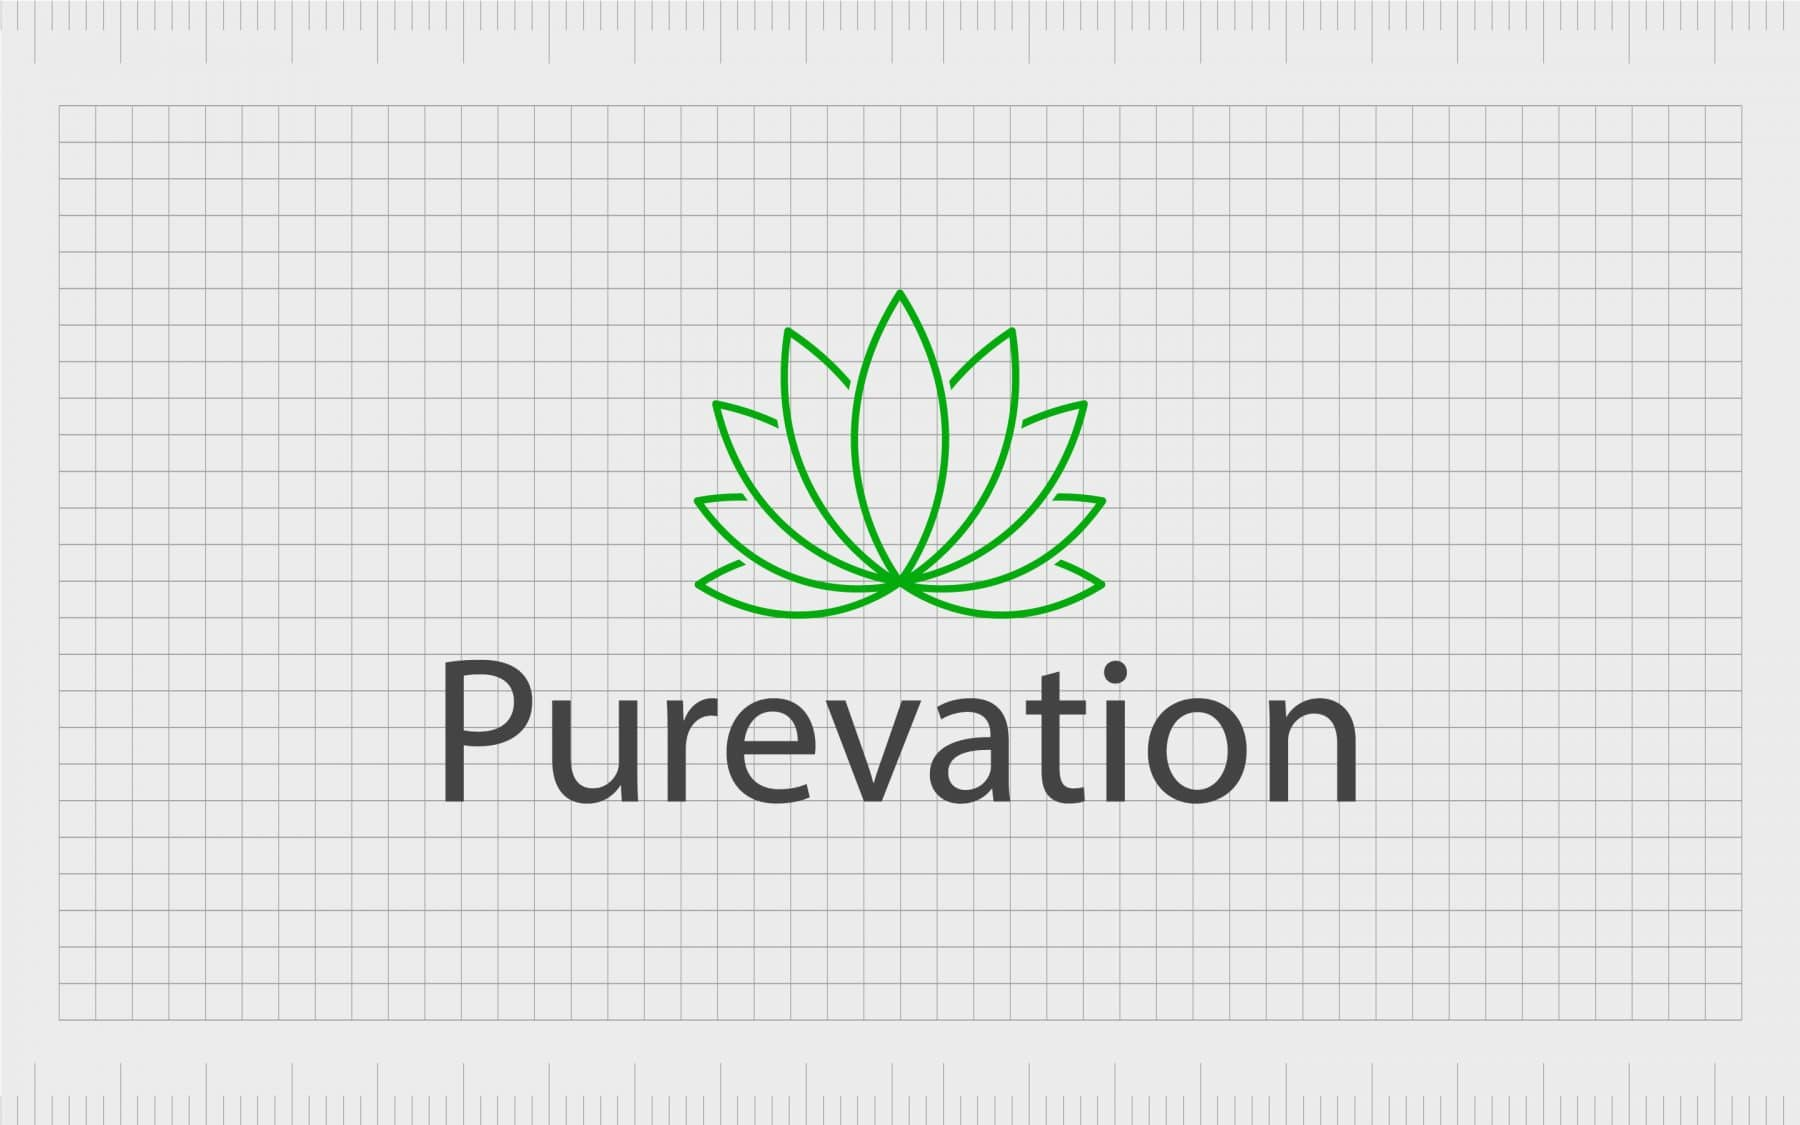 Purevation